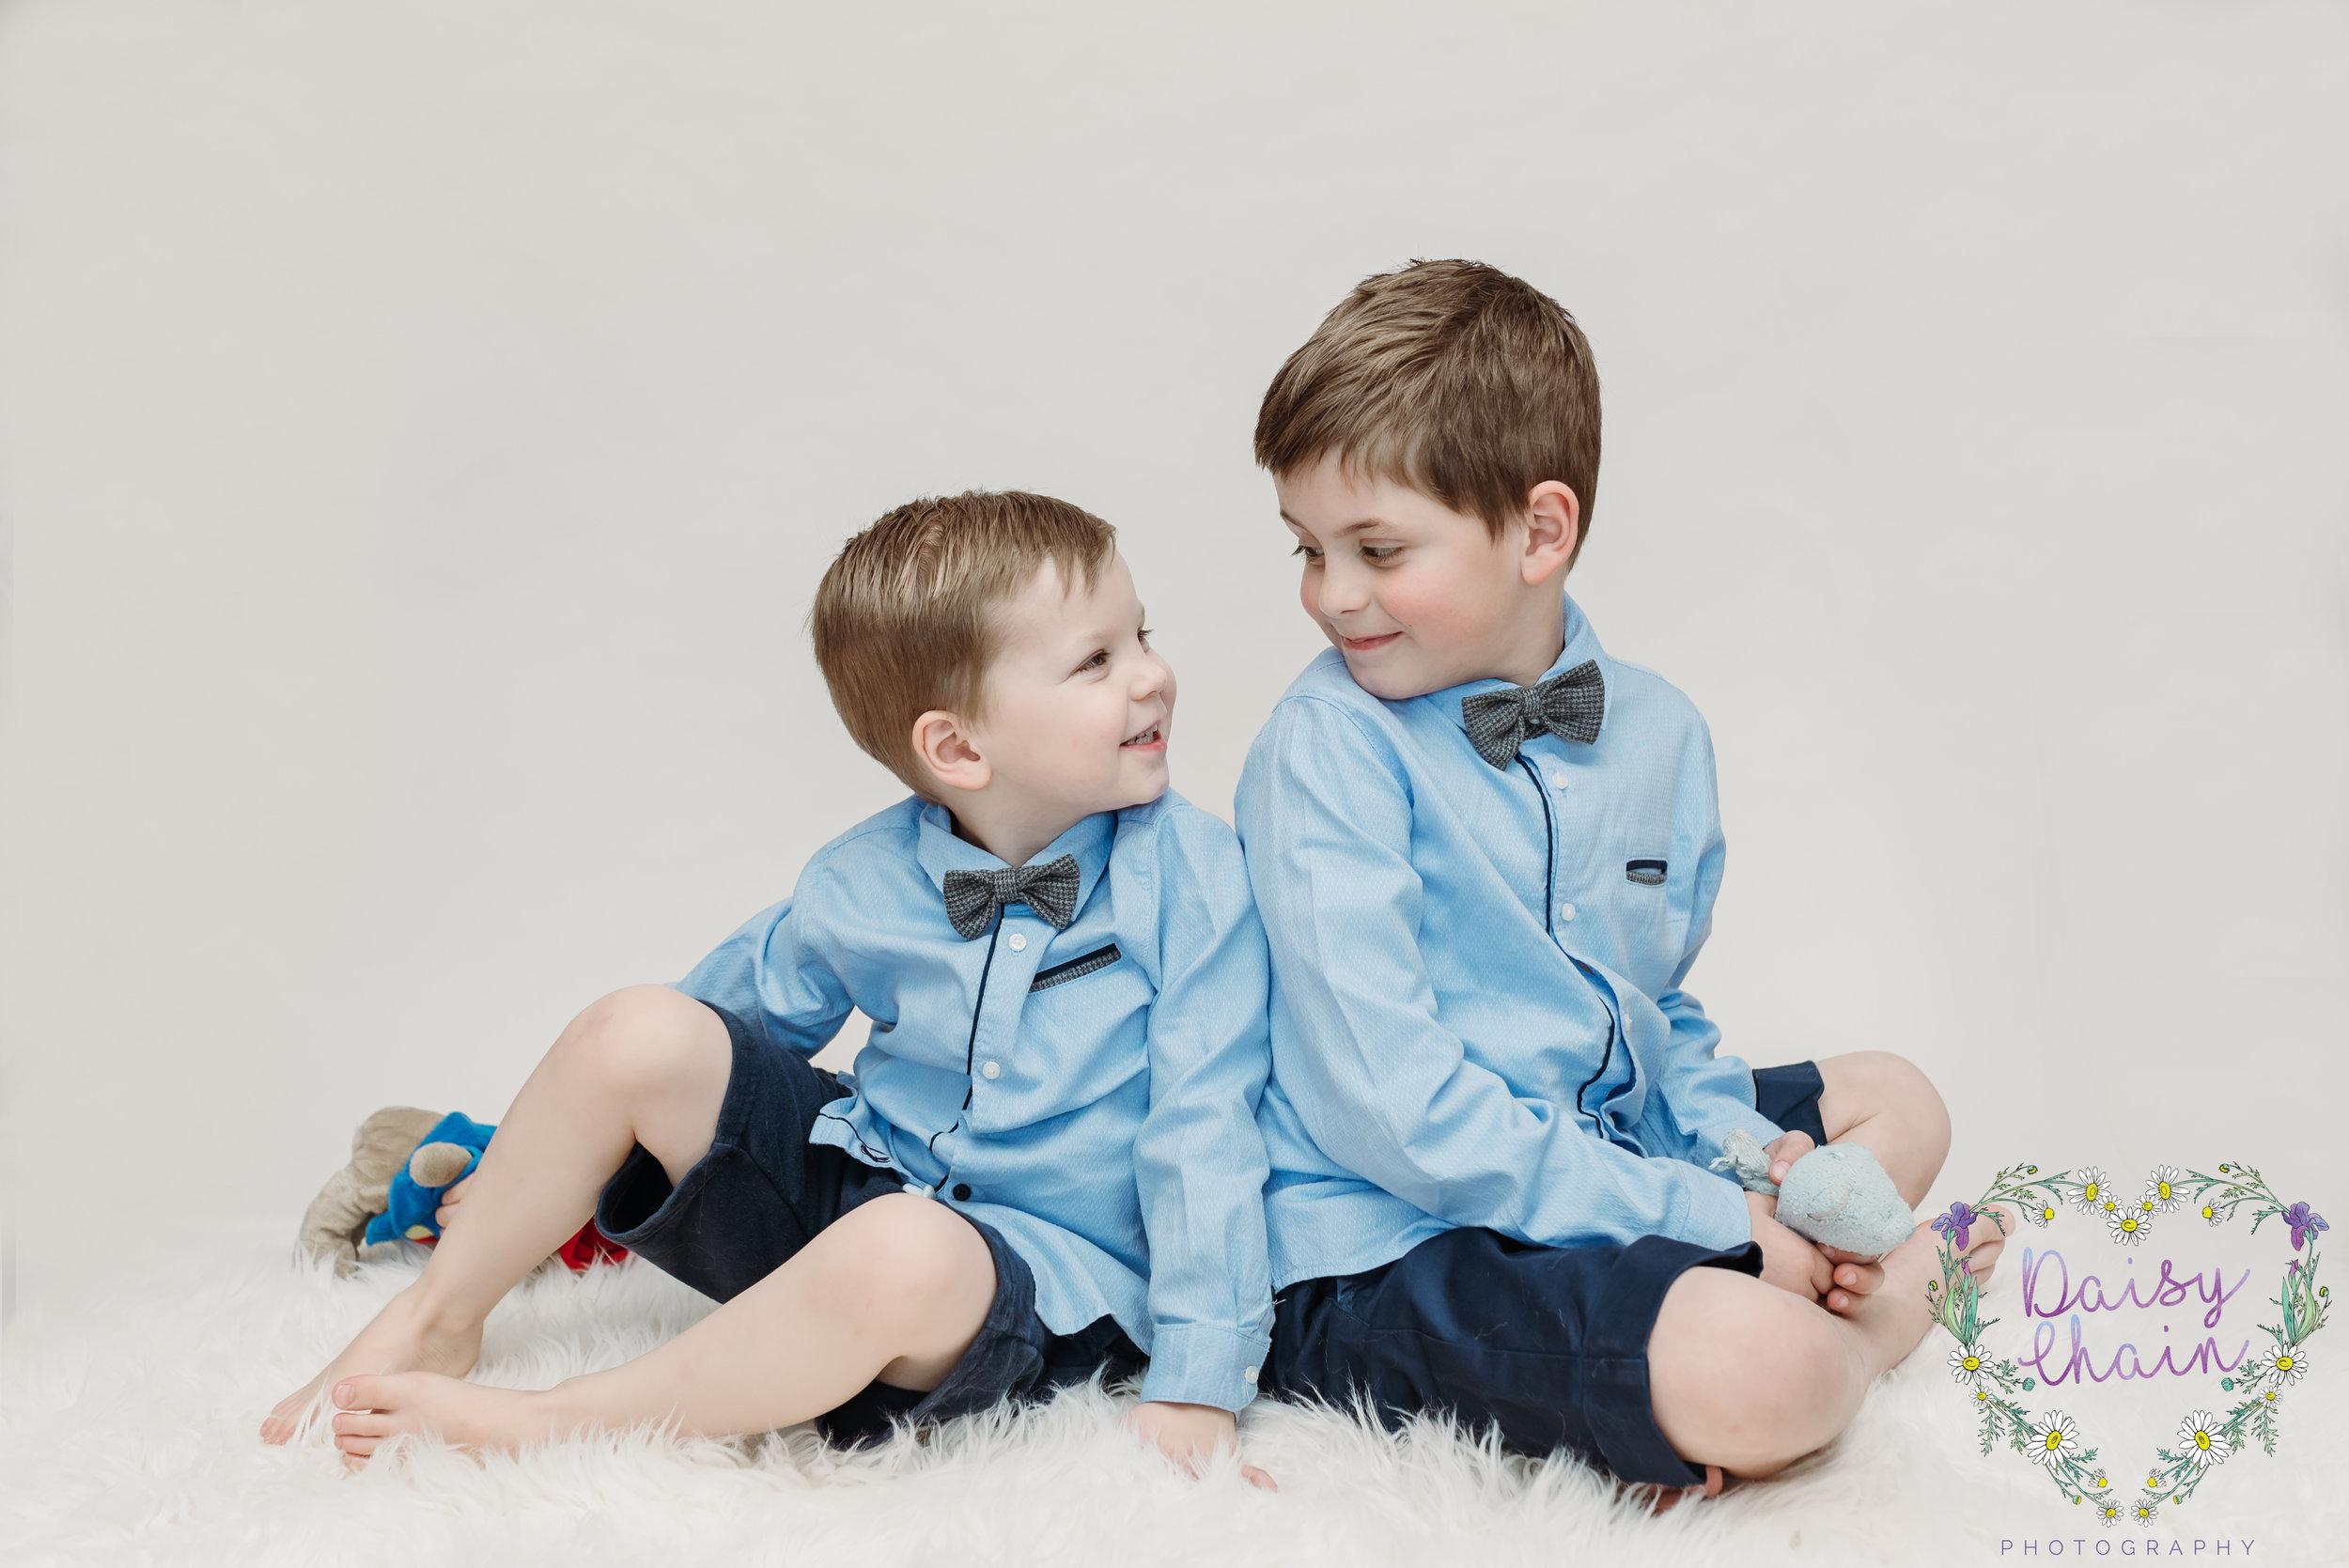 Brothers, siblings photo shoot